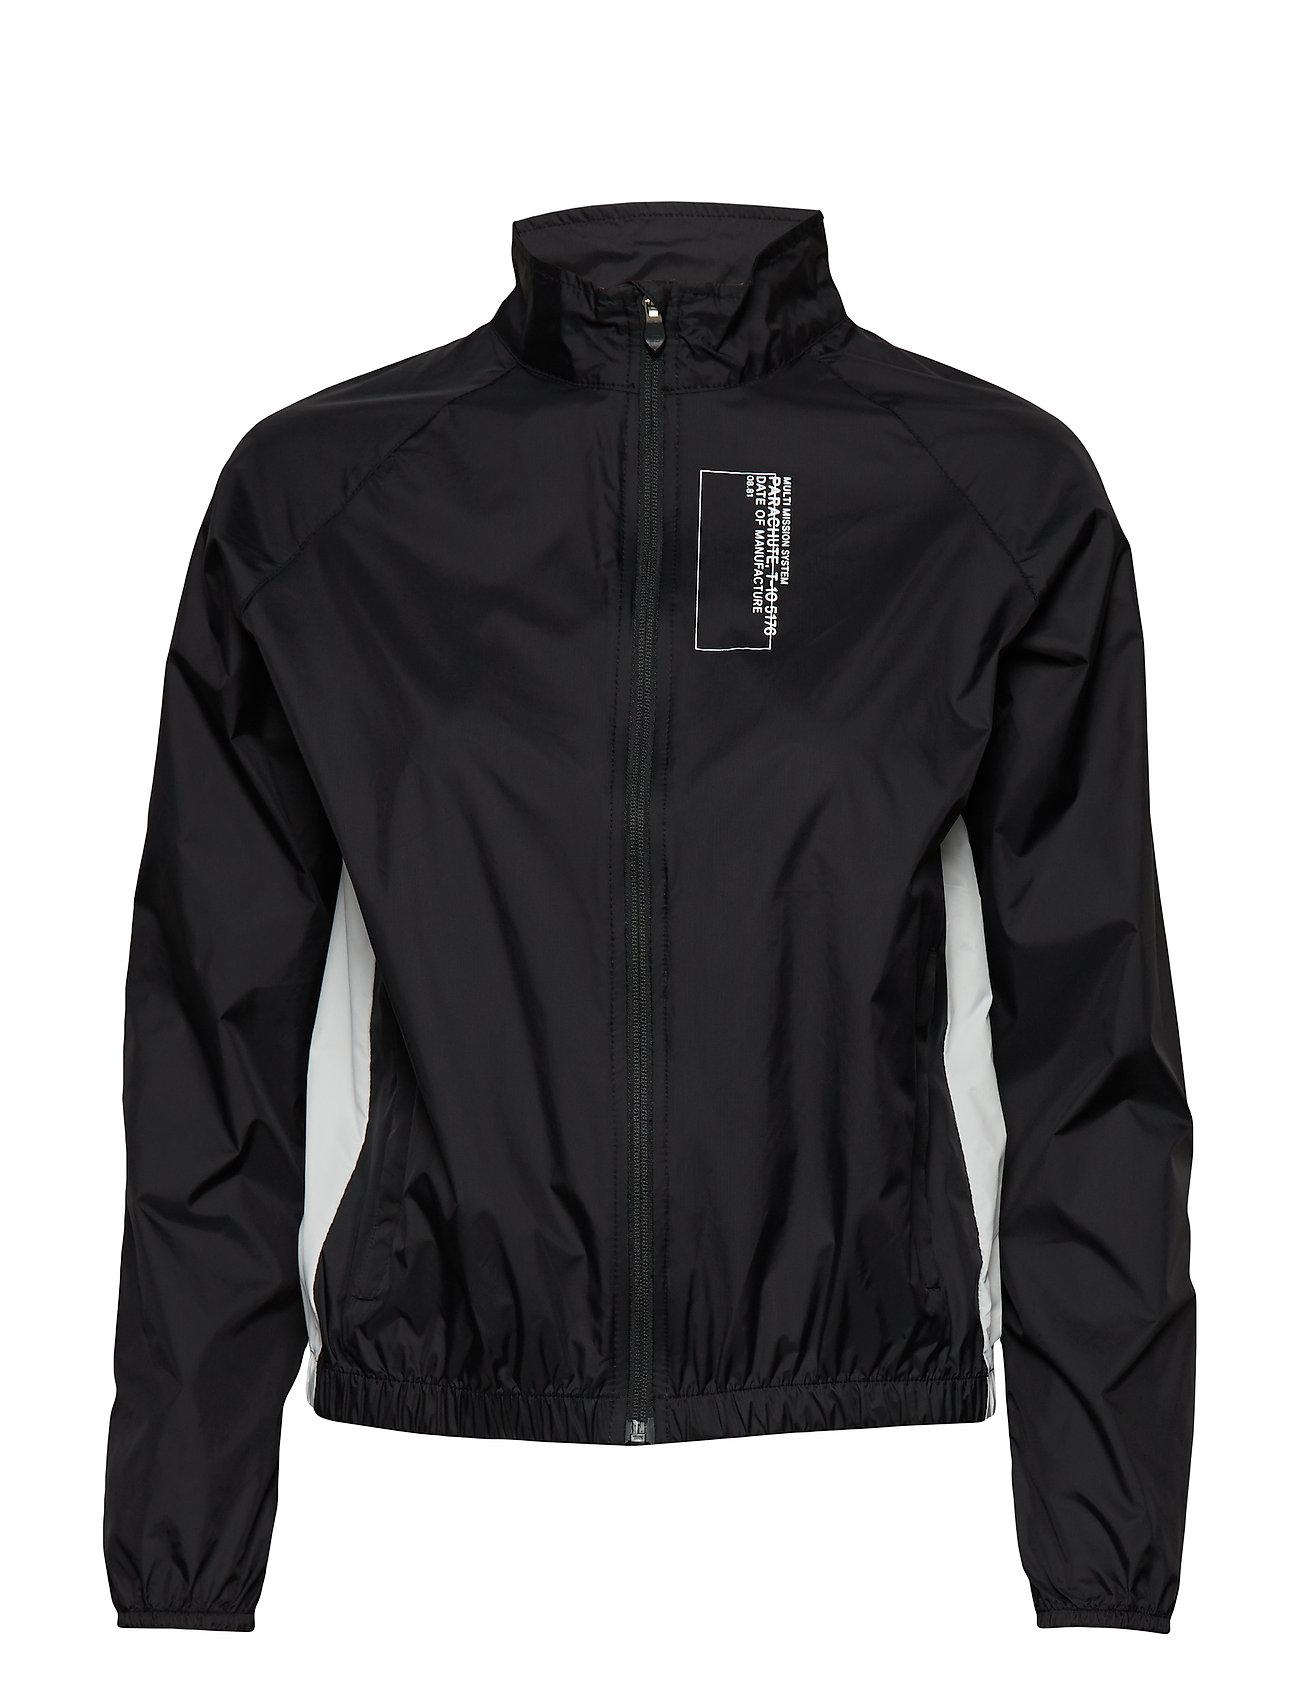 Newline Black Track Jacket